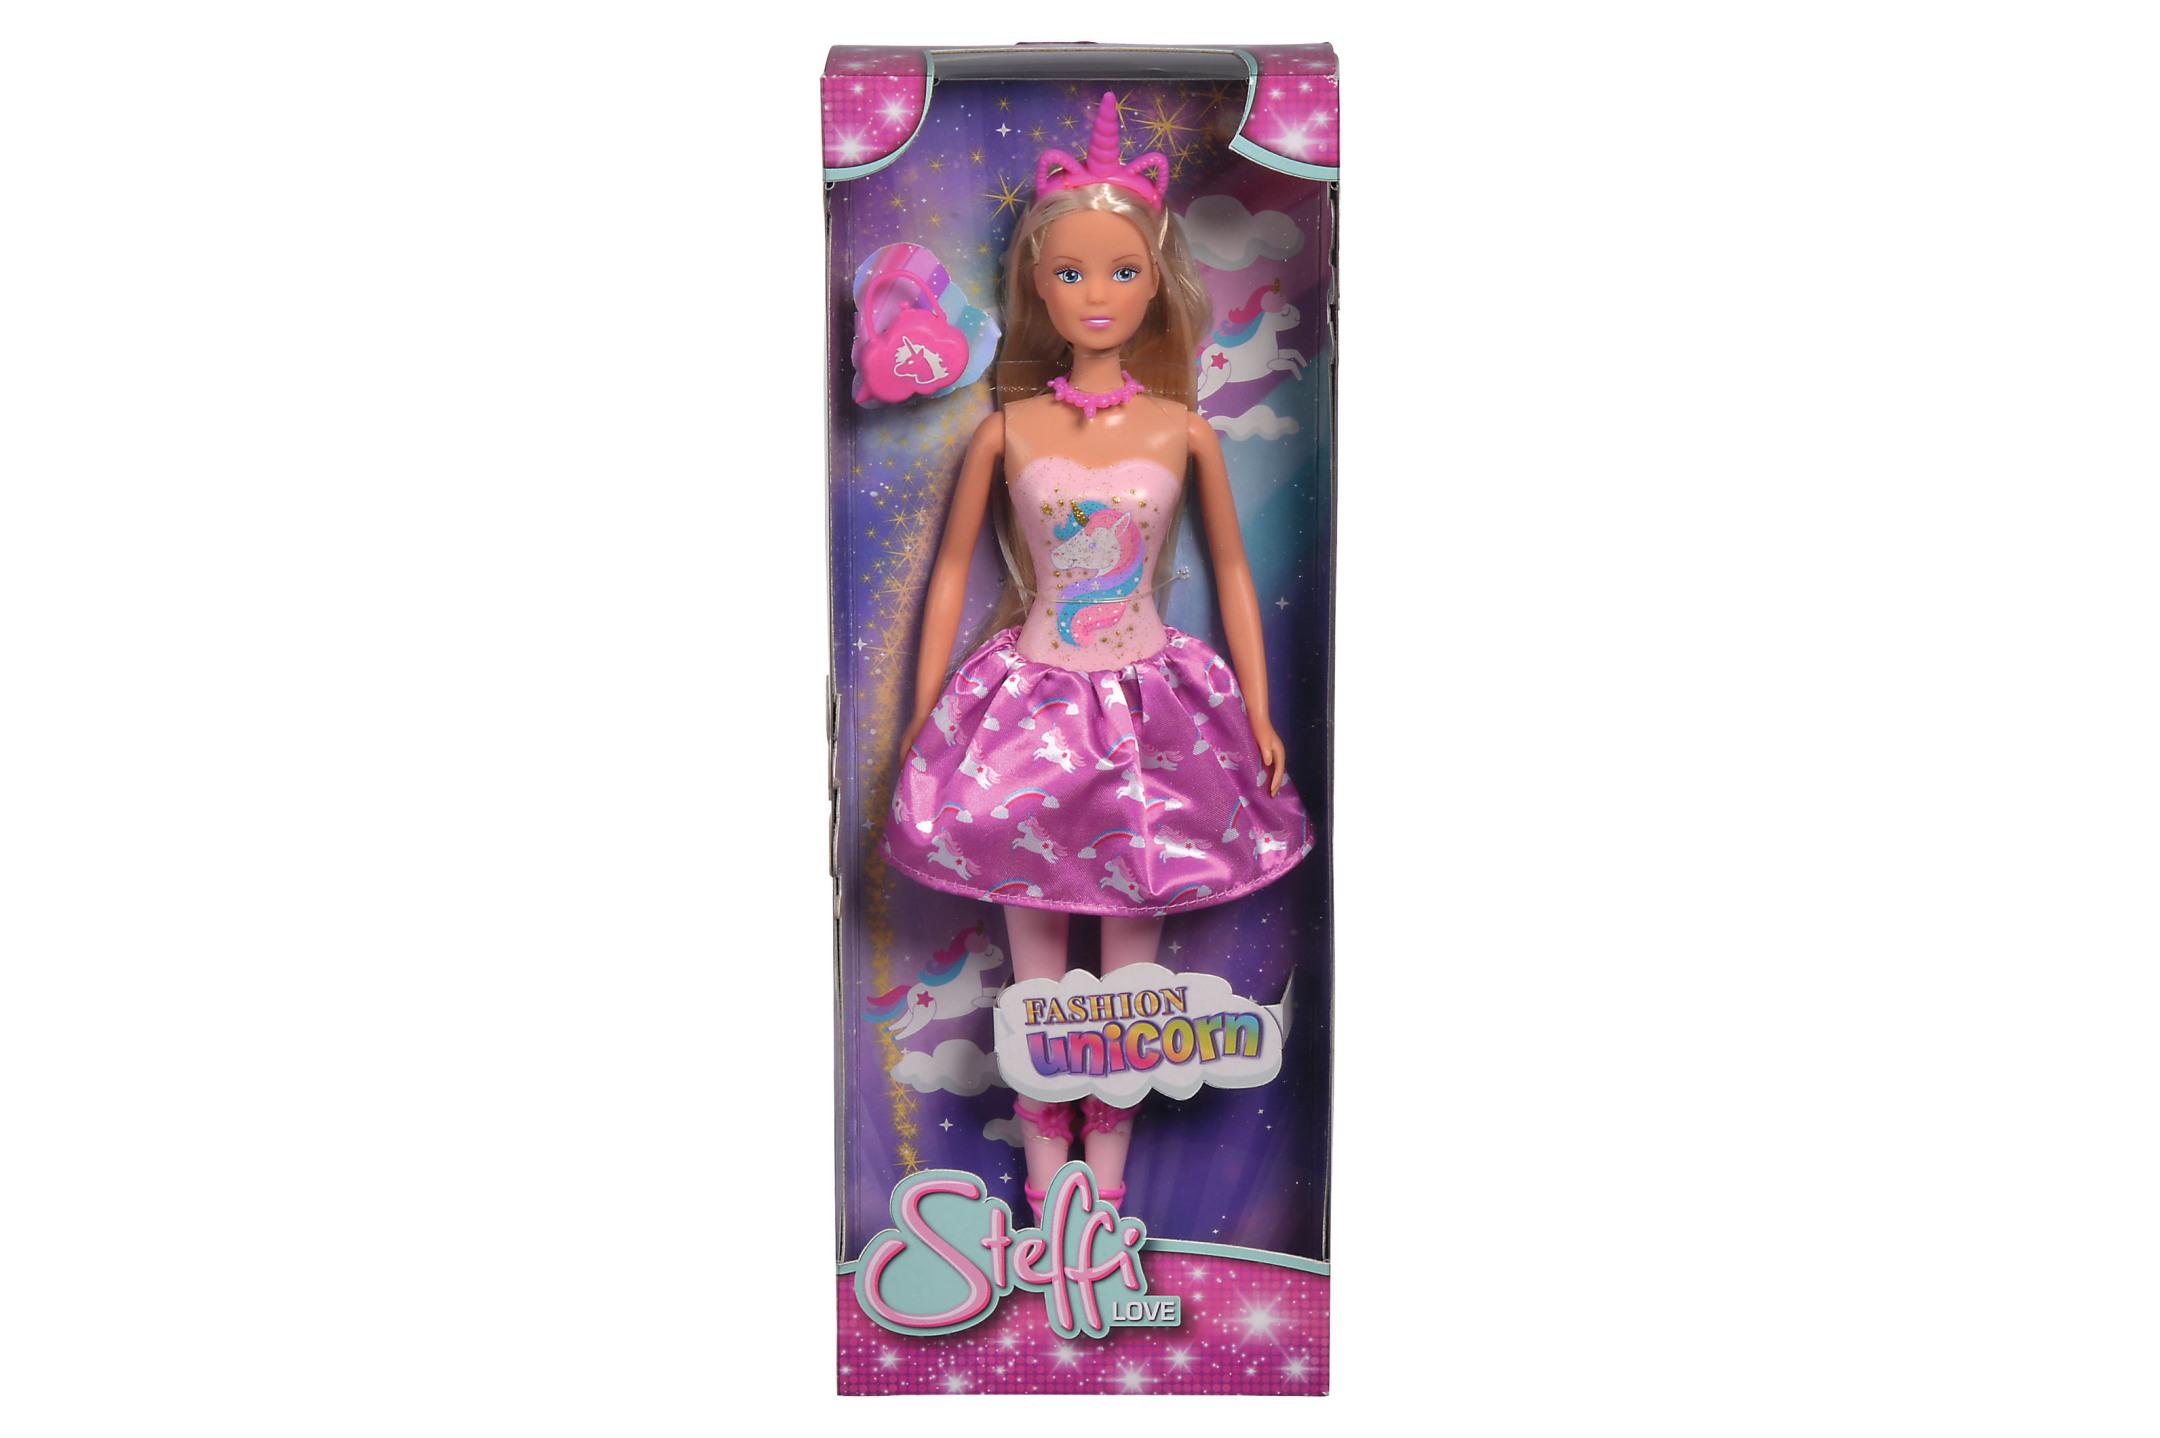 Steffi Love Fashion Unicorn 29cm